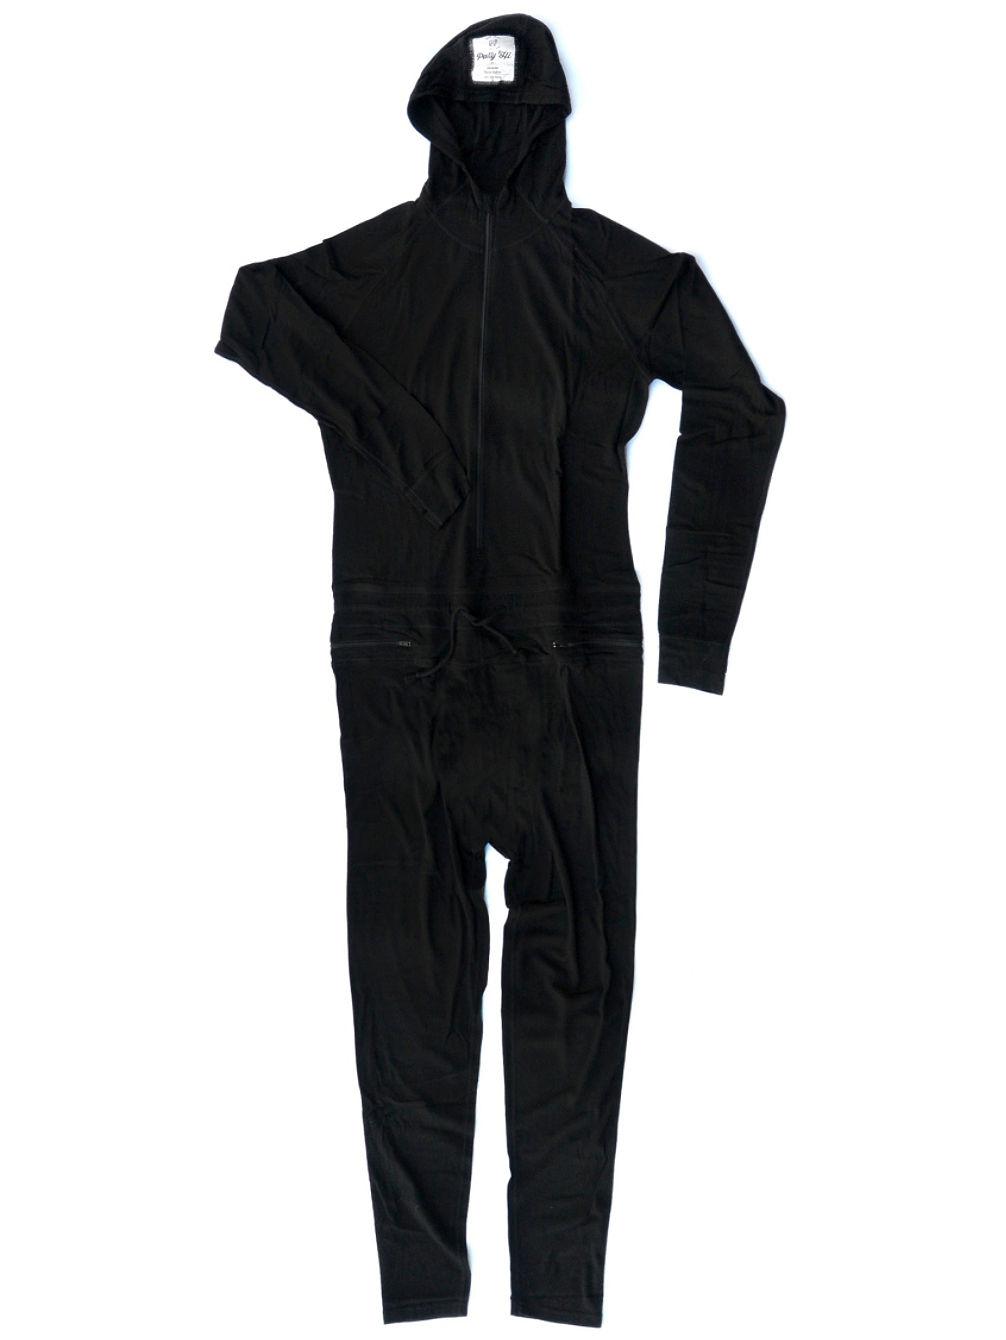 pally-hi-merino-boiler-tech-suit